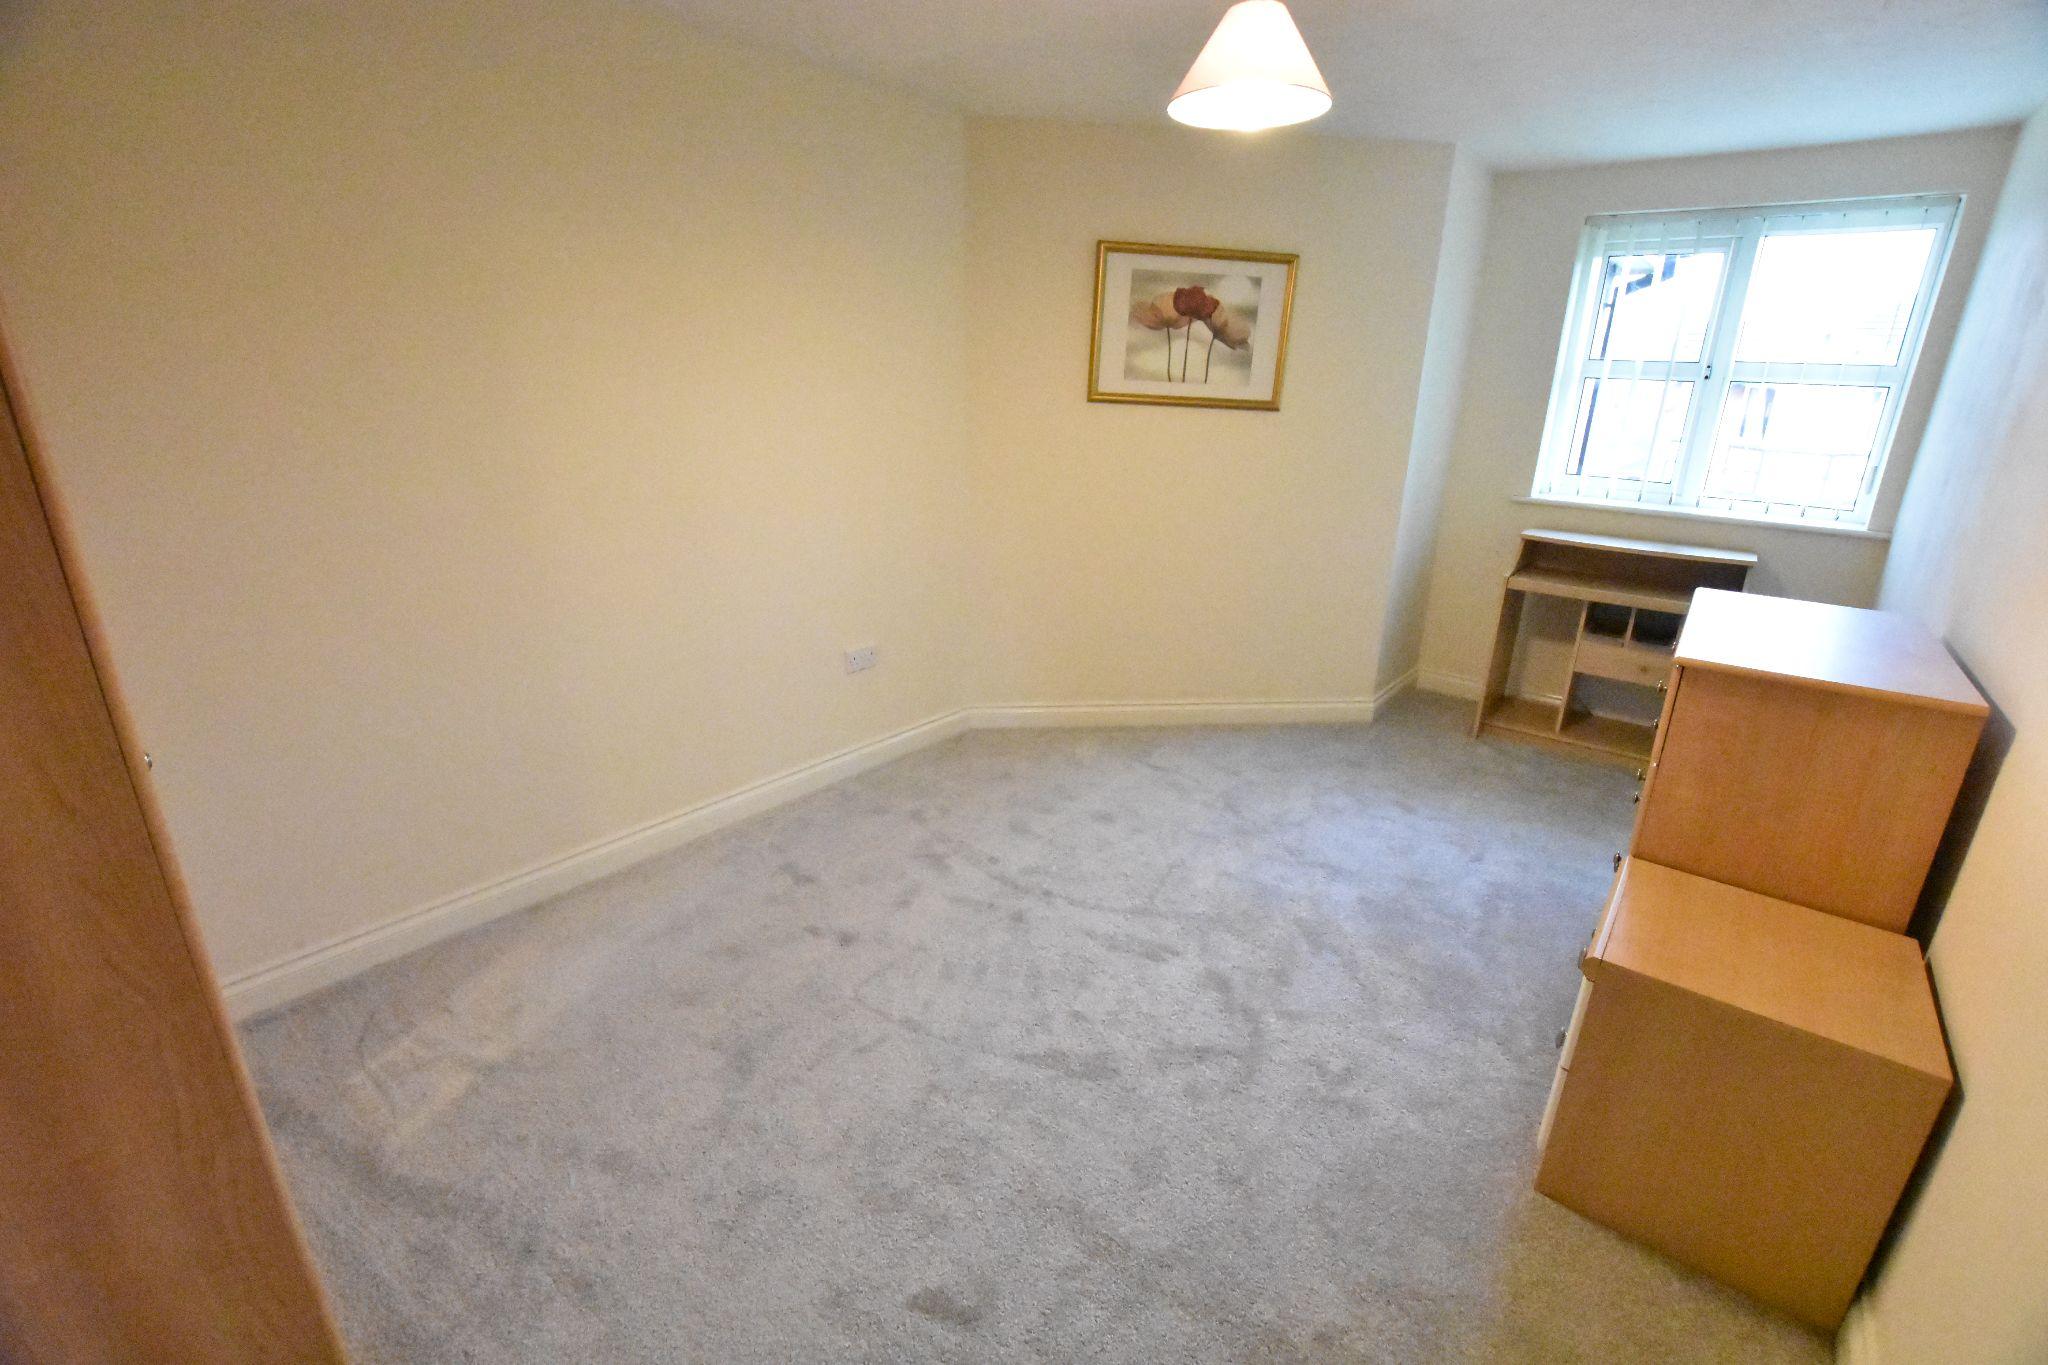 2 bedroom apartment flat/apartment Sold STC in Preston - Bedroom 2